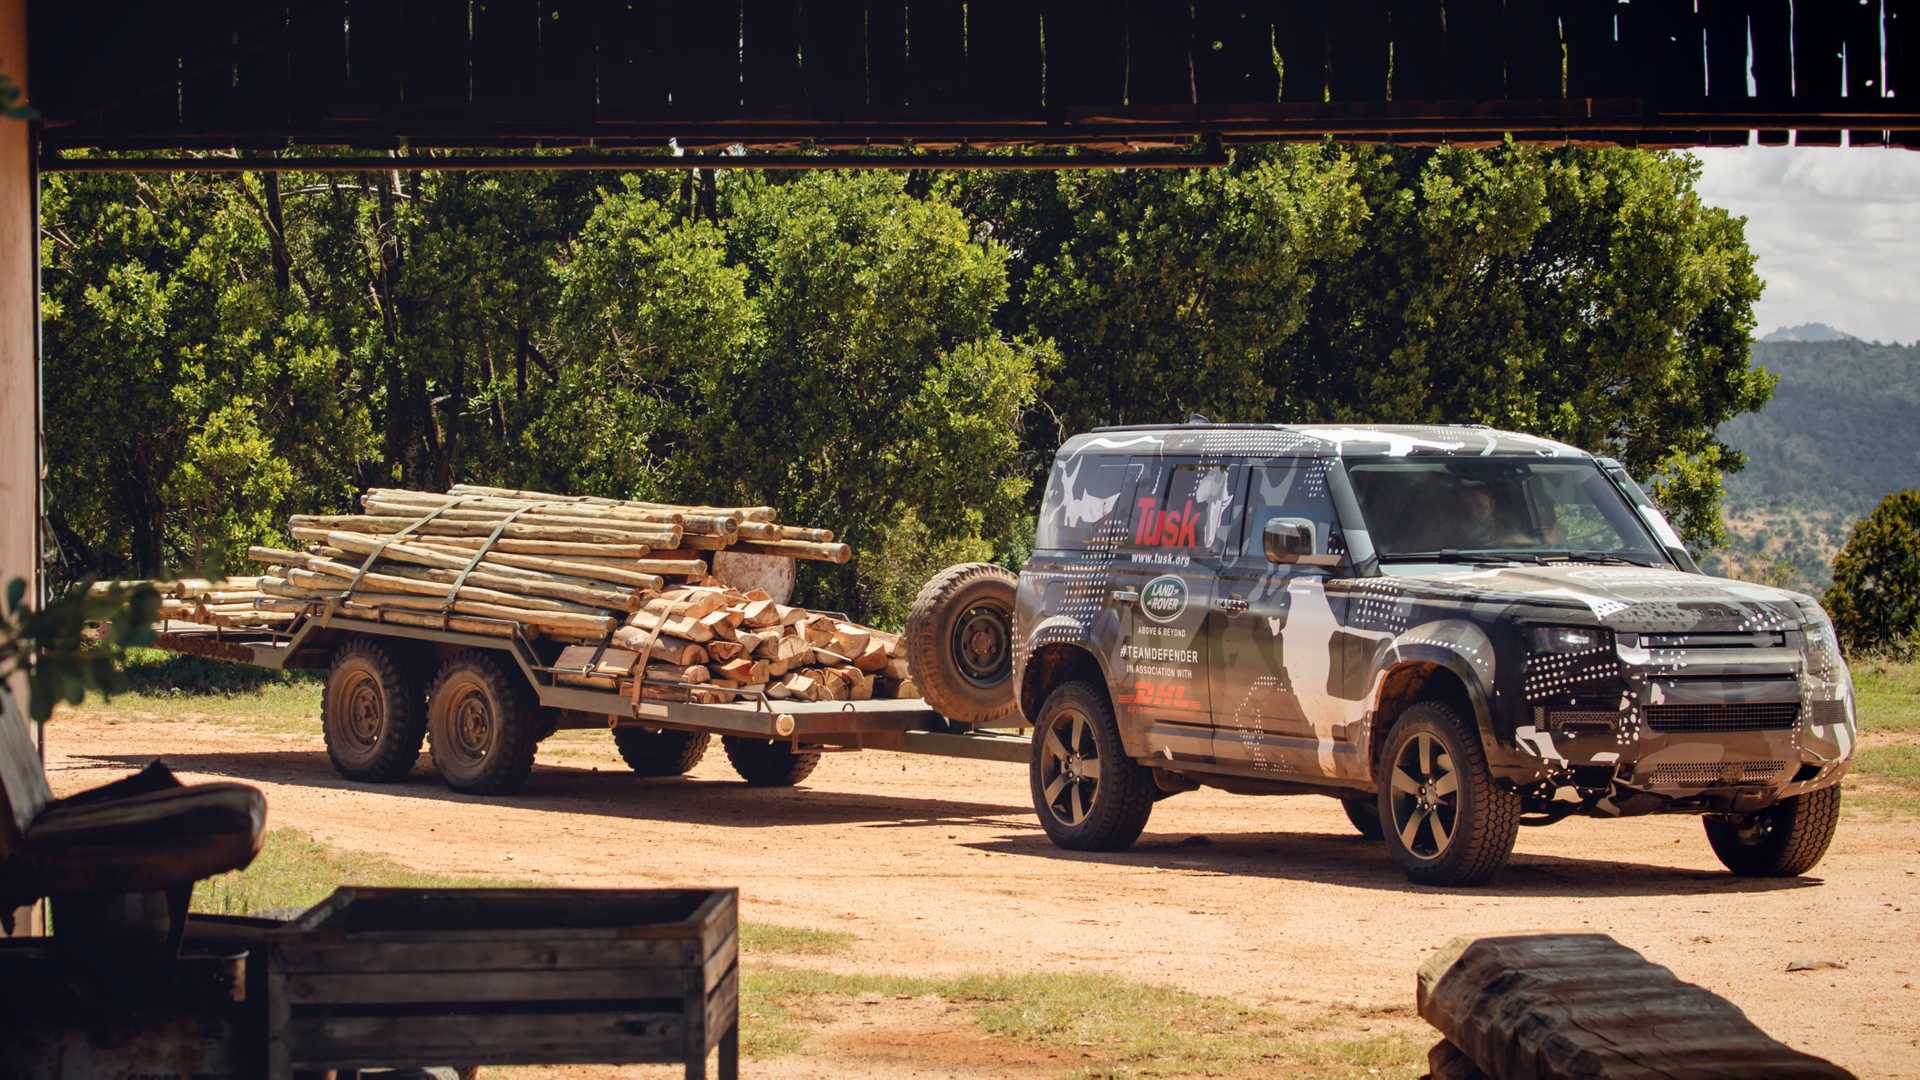 2020-land-rover-defender-testing-in-keny